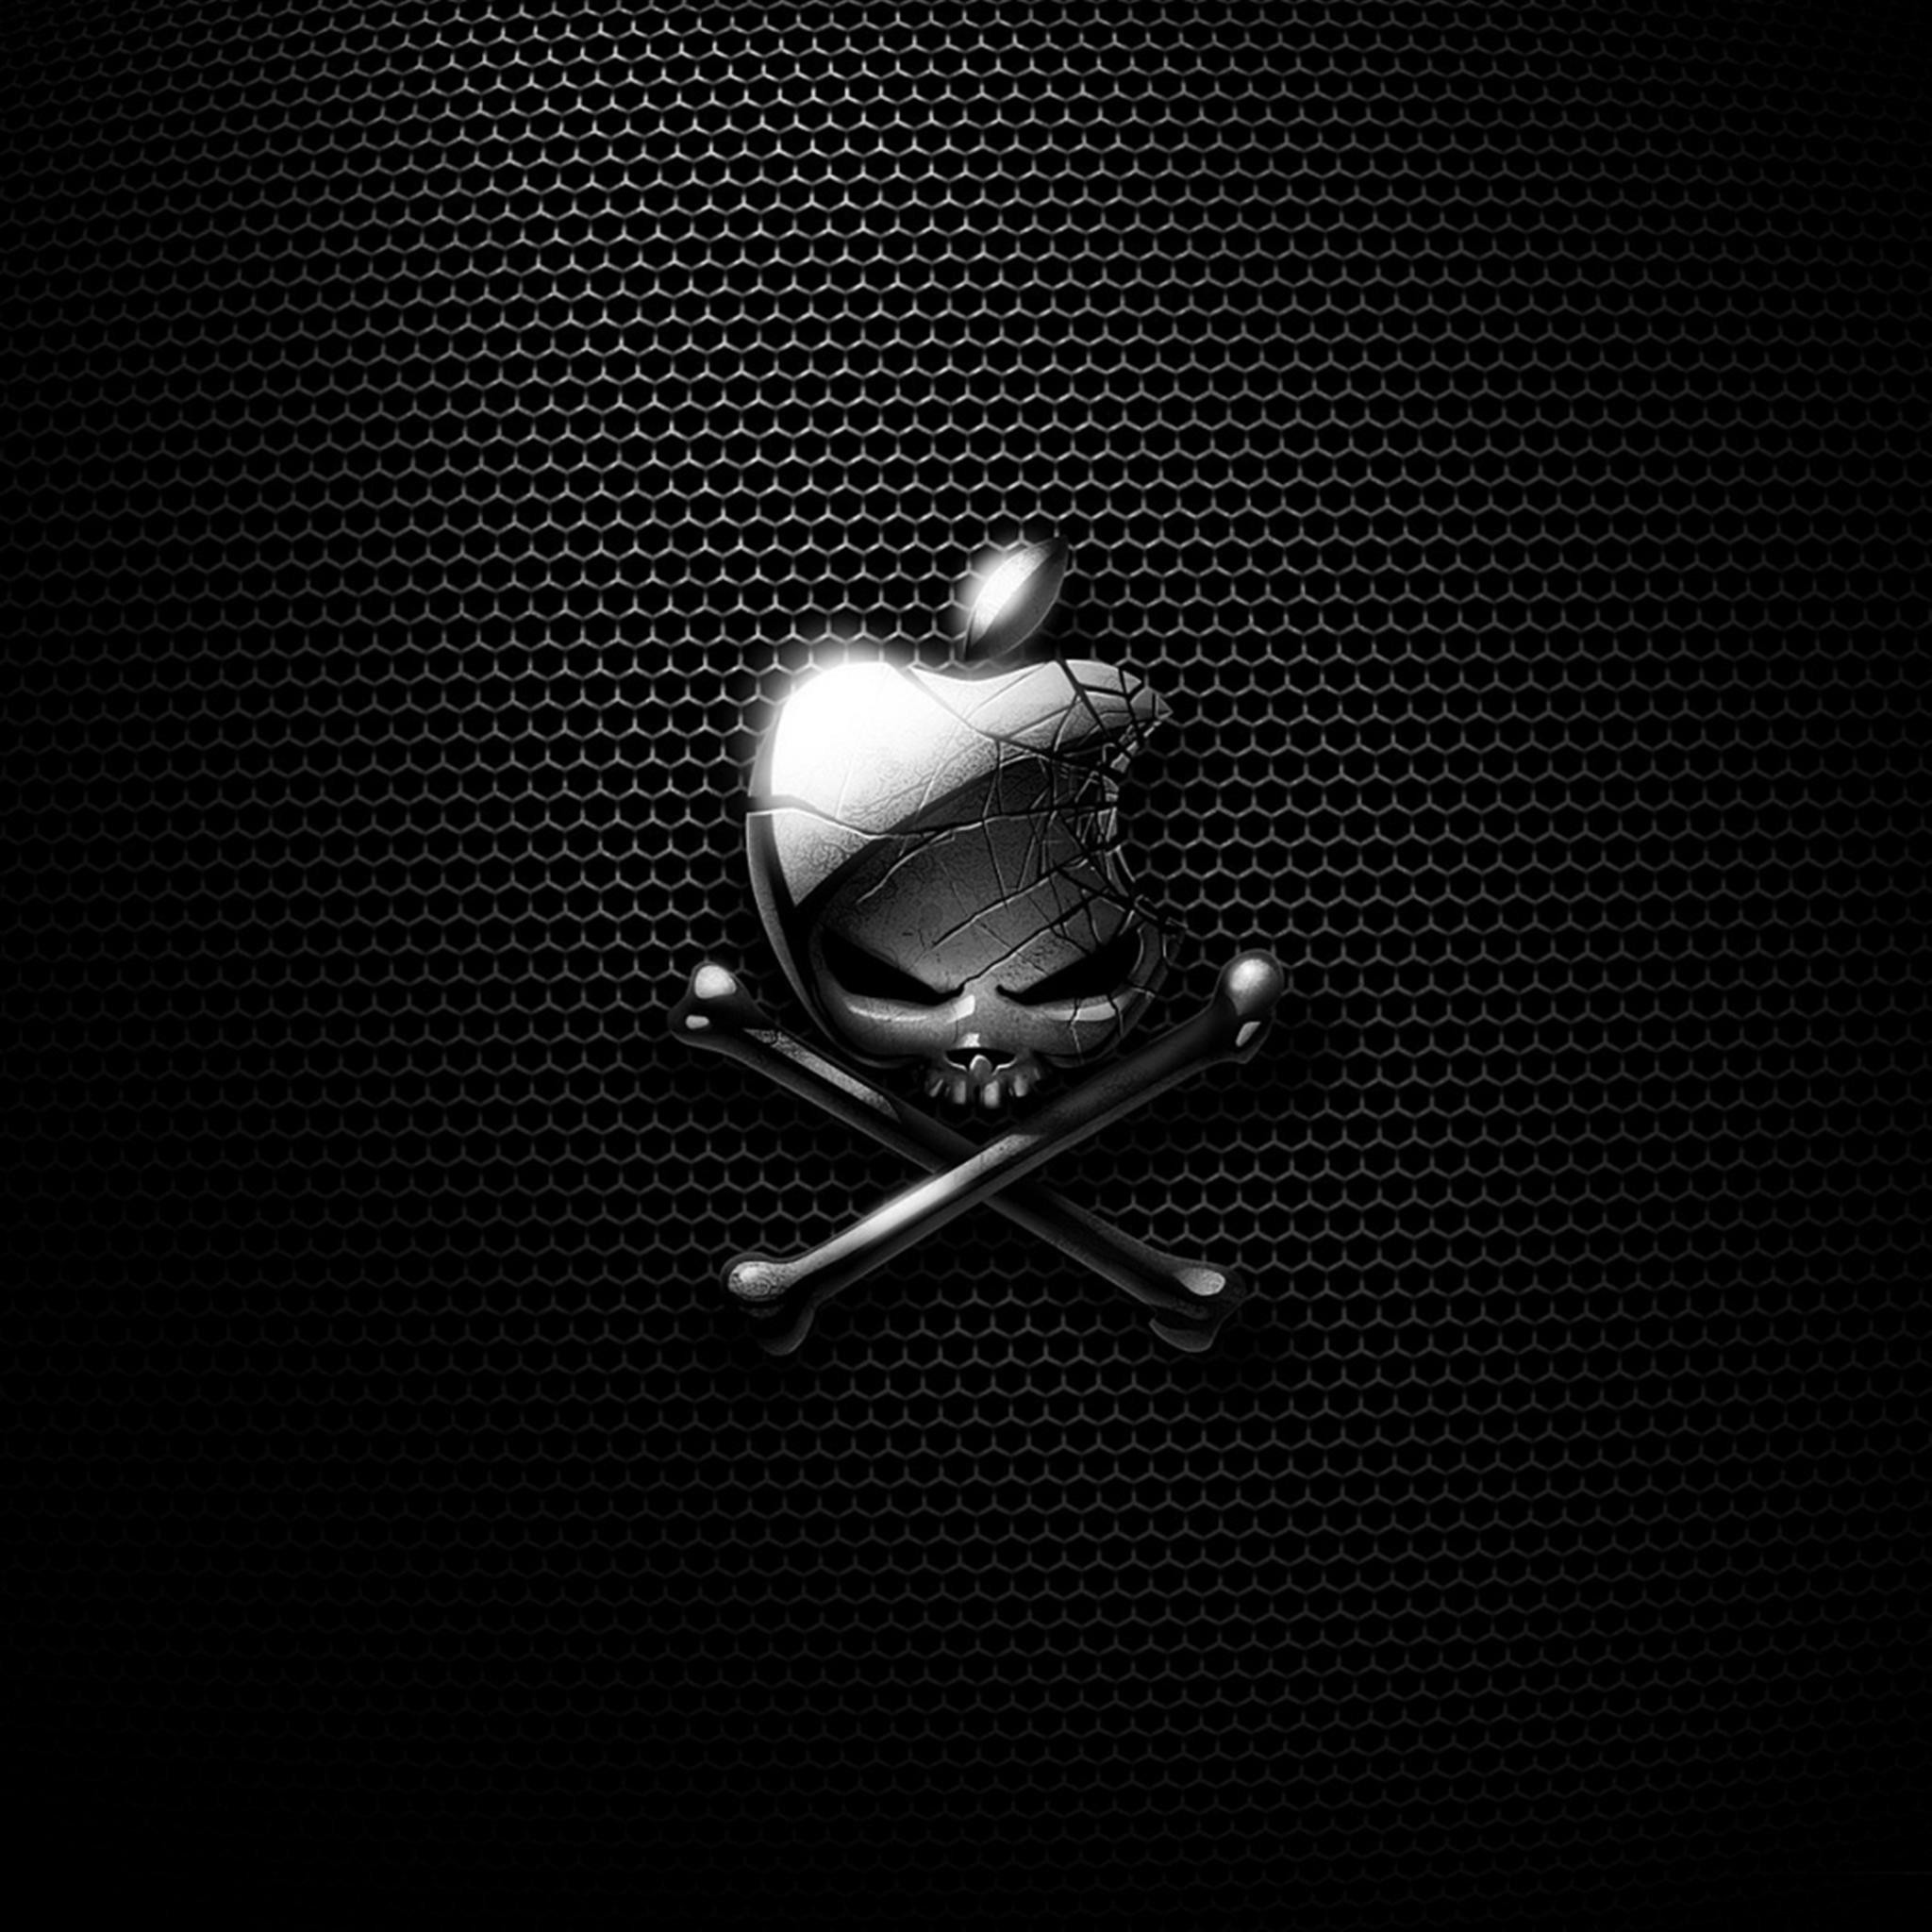 Apple iPad Air Wallpapers HD 79